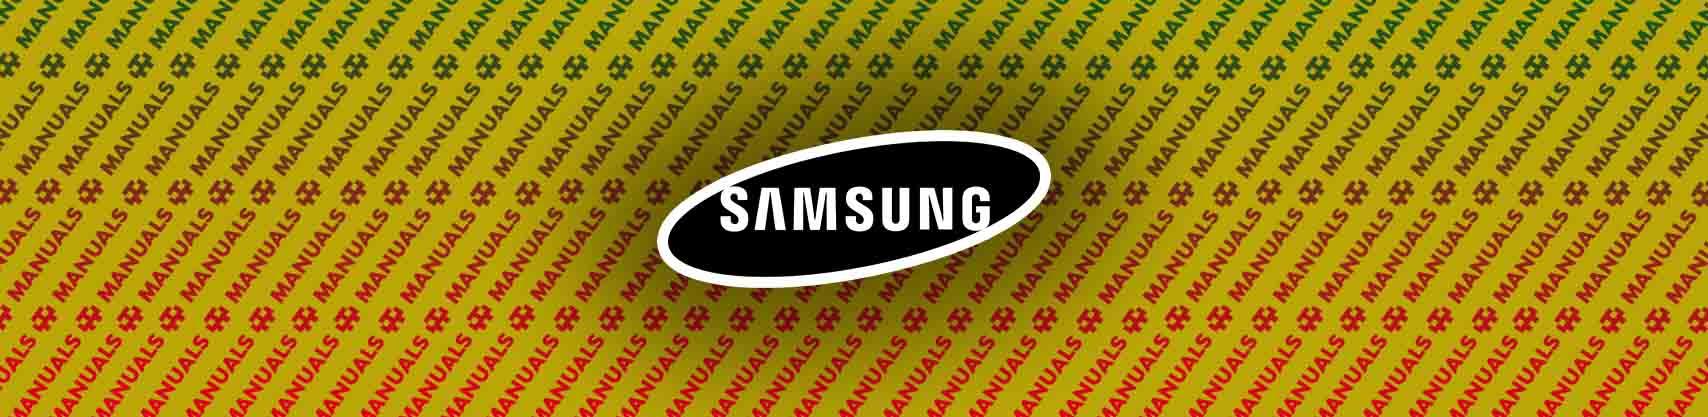 Samsung RF28HMELBSR Manual